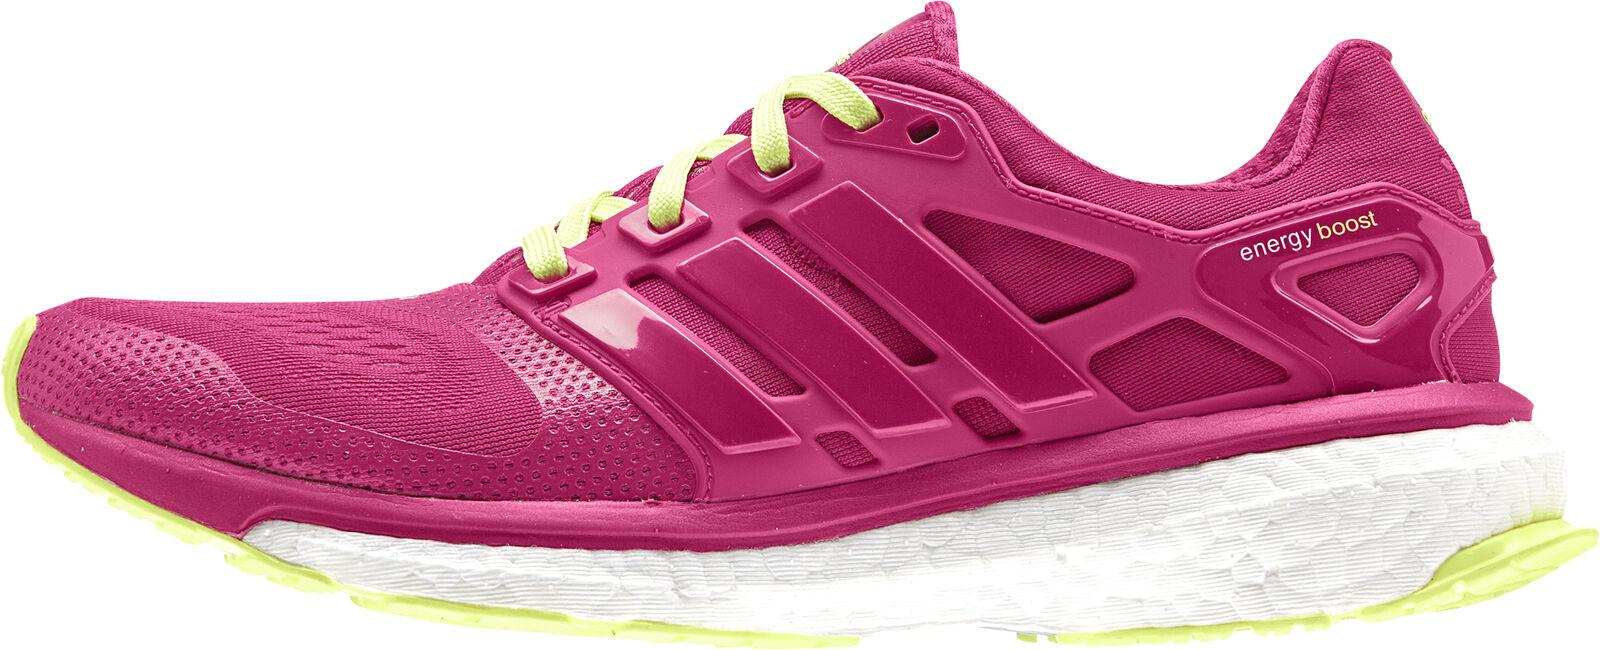 Adidas Energy Boost ESM mujer Running zapatos - rosado